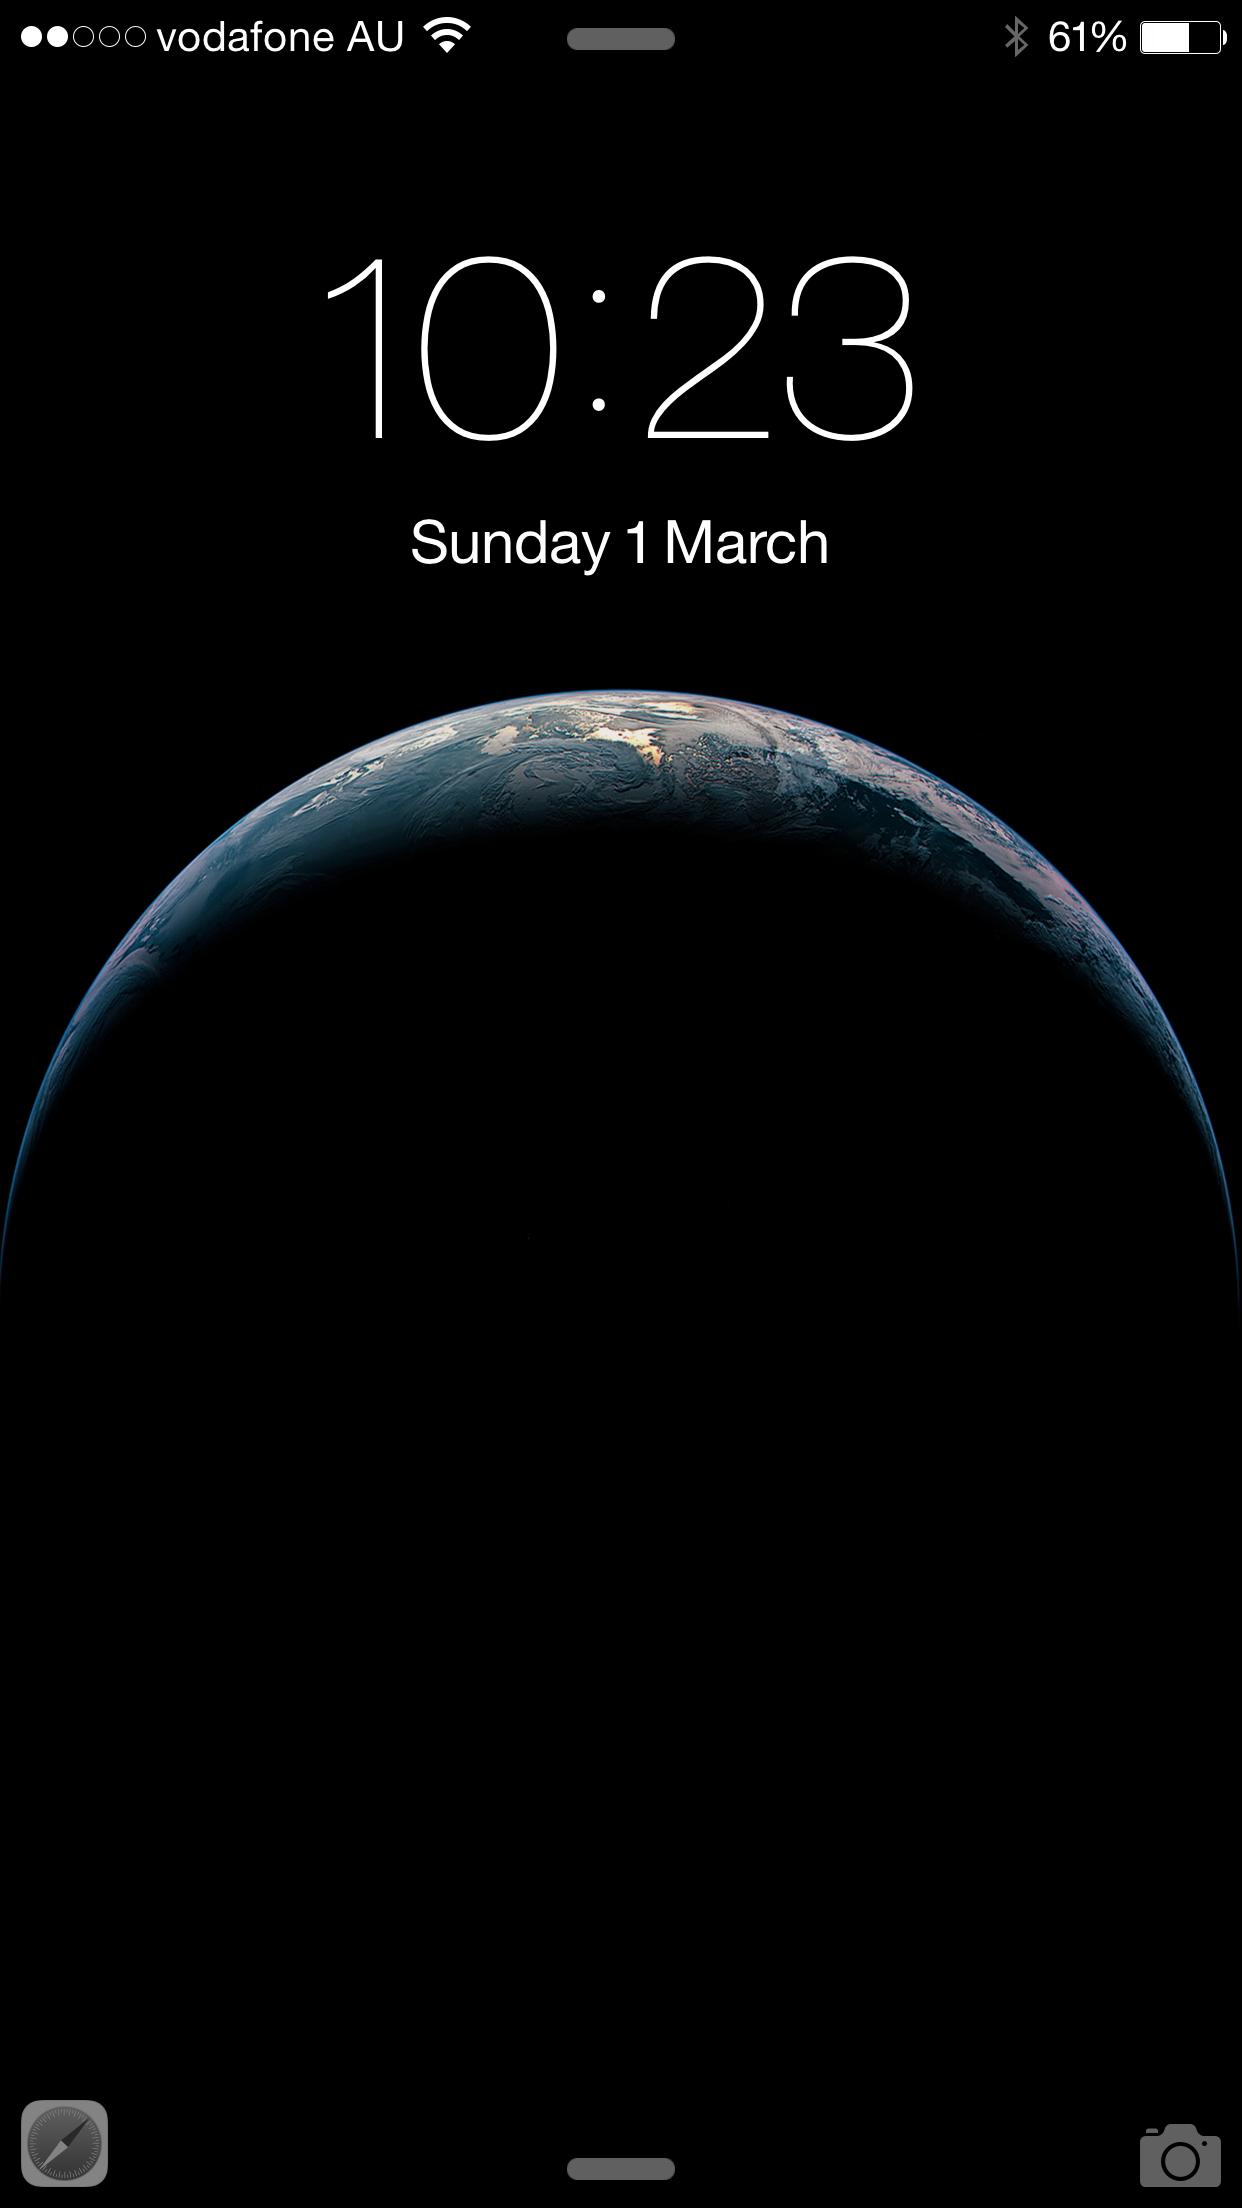 iPhone - iPhone 6 Plus Wallpaper Dimensions | Page 3 | MacRumors | Liwe W | Iphone 5 wallpaper ...